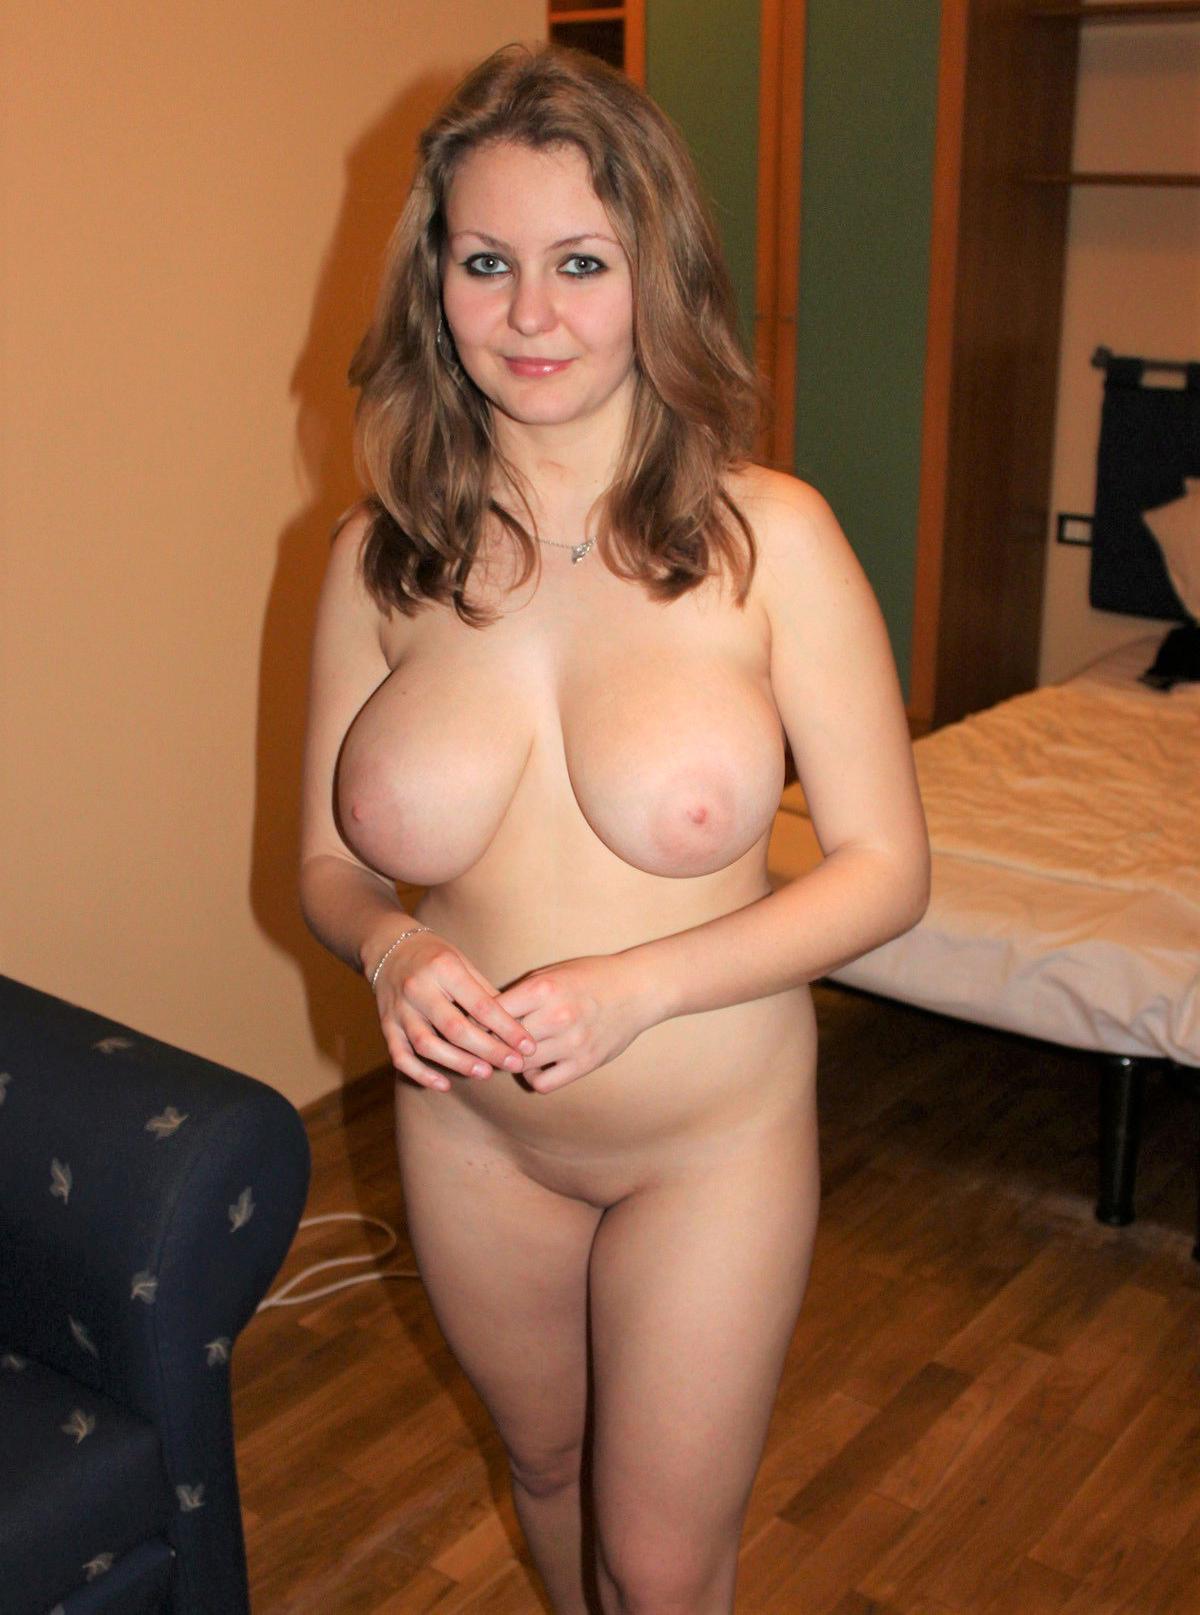 Undefiled milfs posing nude